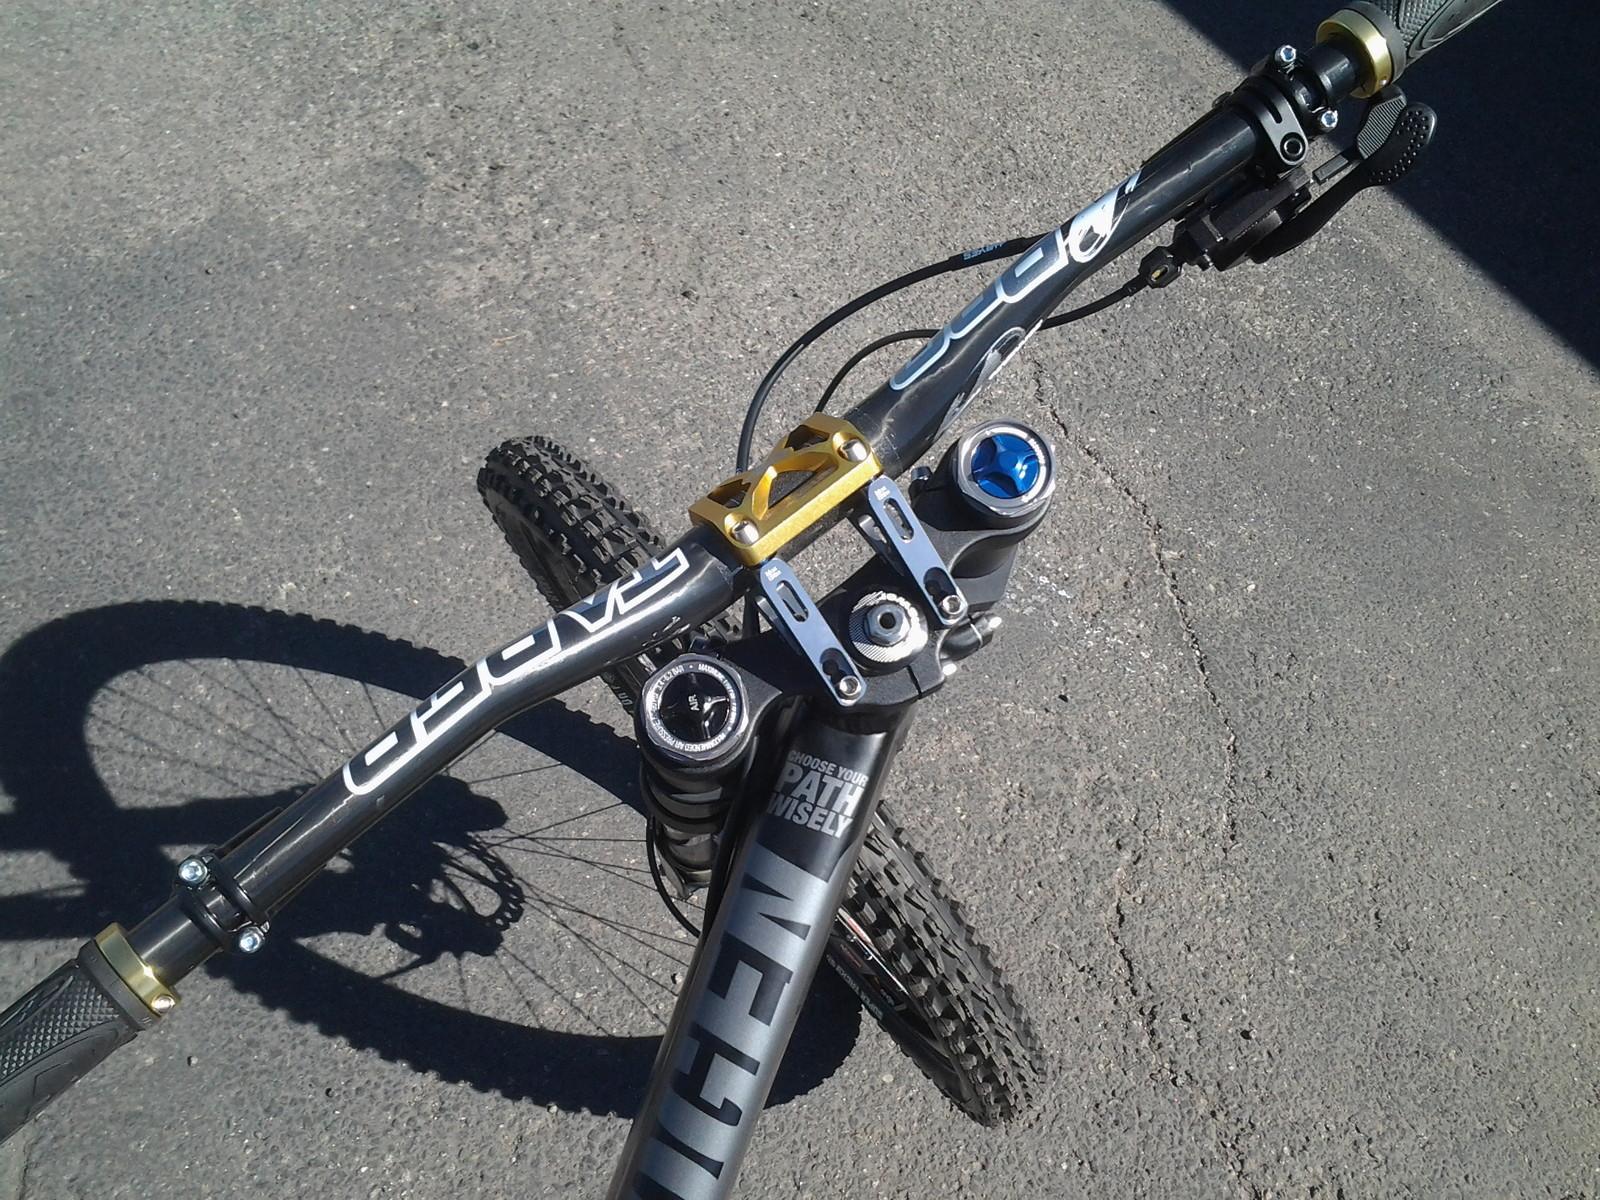 Airborne Pathogen Black Plague Hayesed Edition - JordanJoker10 - Mountain Biking Pictures - Vital MTB